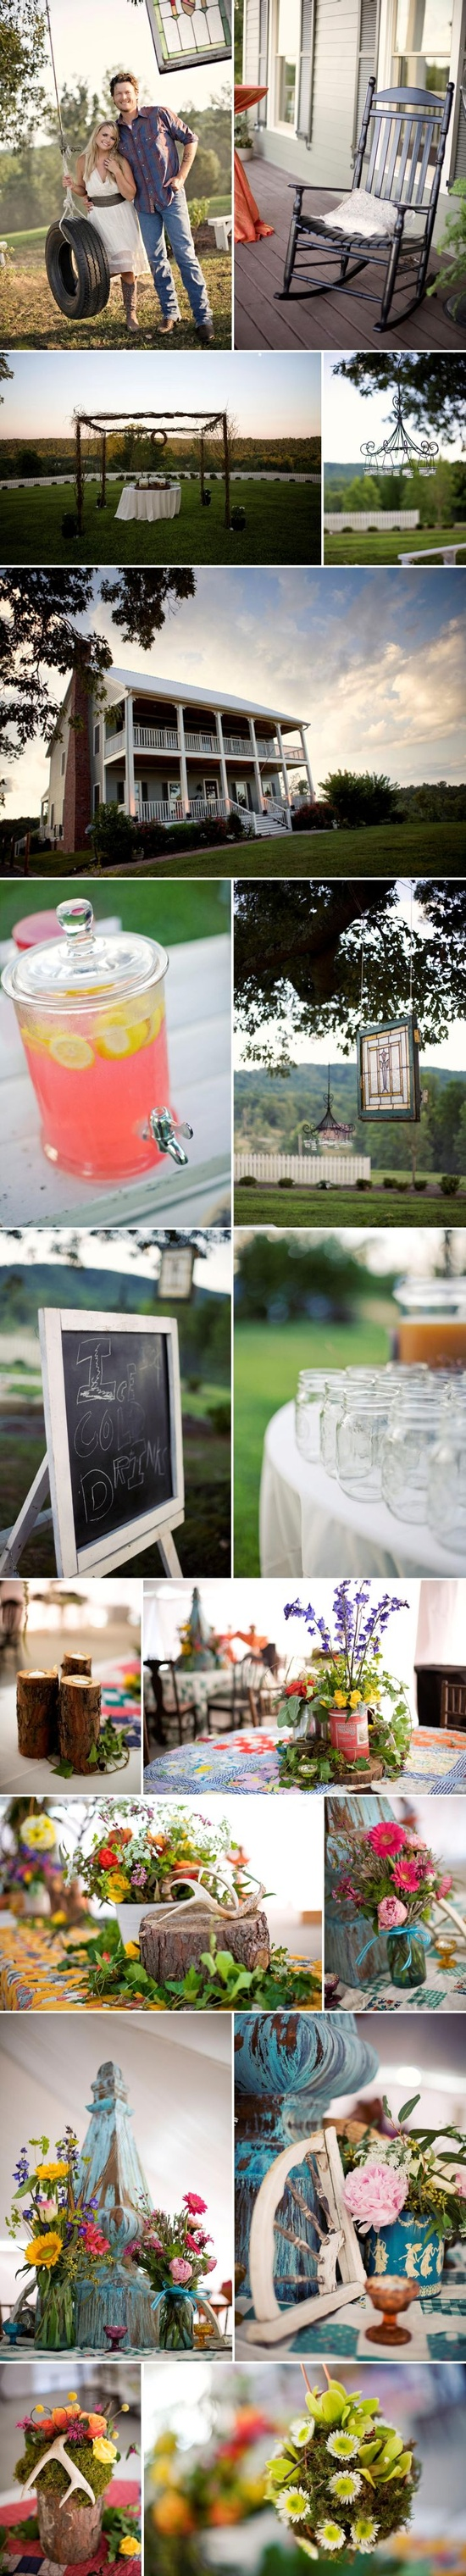 miranda lambert & blake shelton's engagement party!